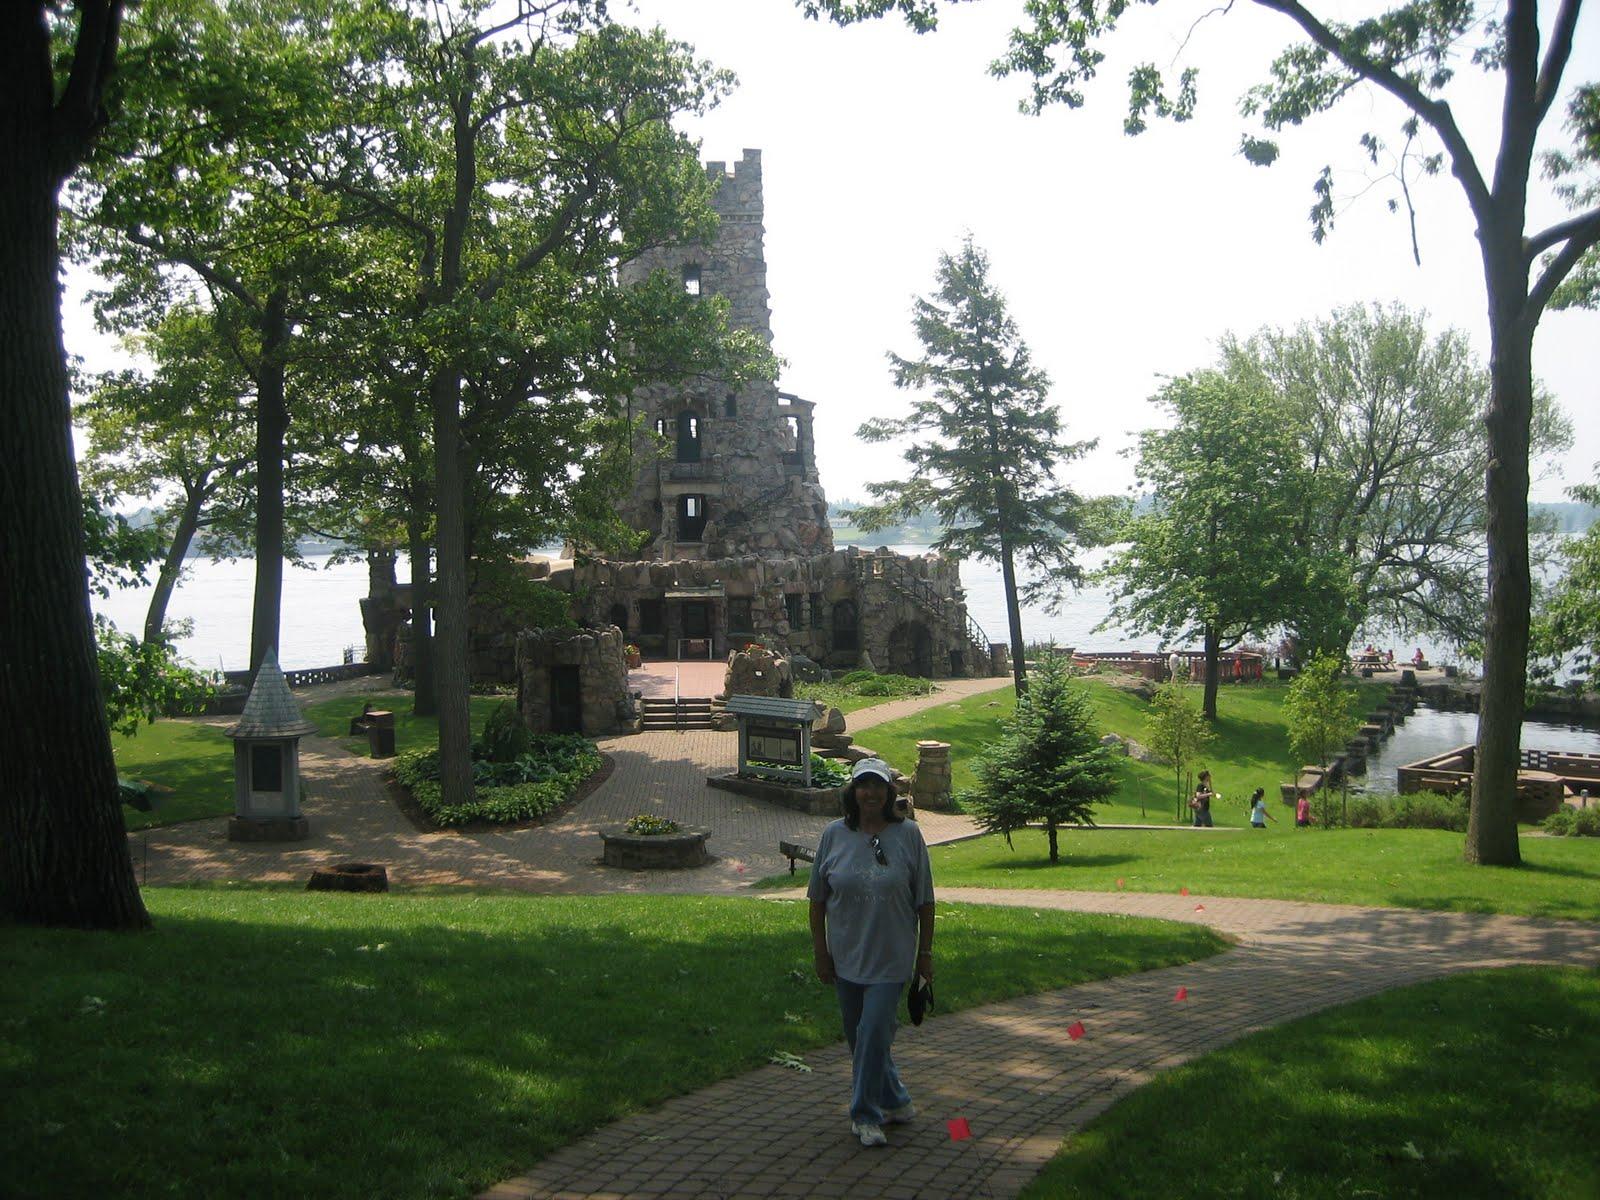 Kick S Travels Boldt Castle On Heart Island